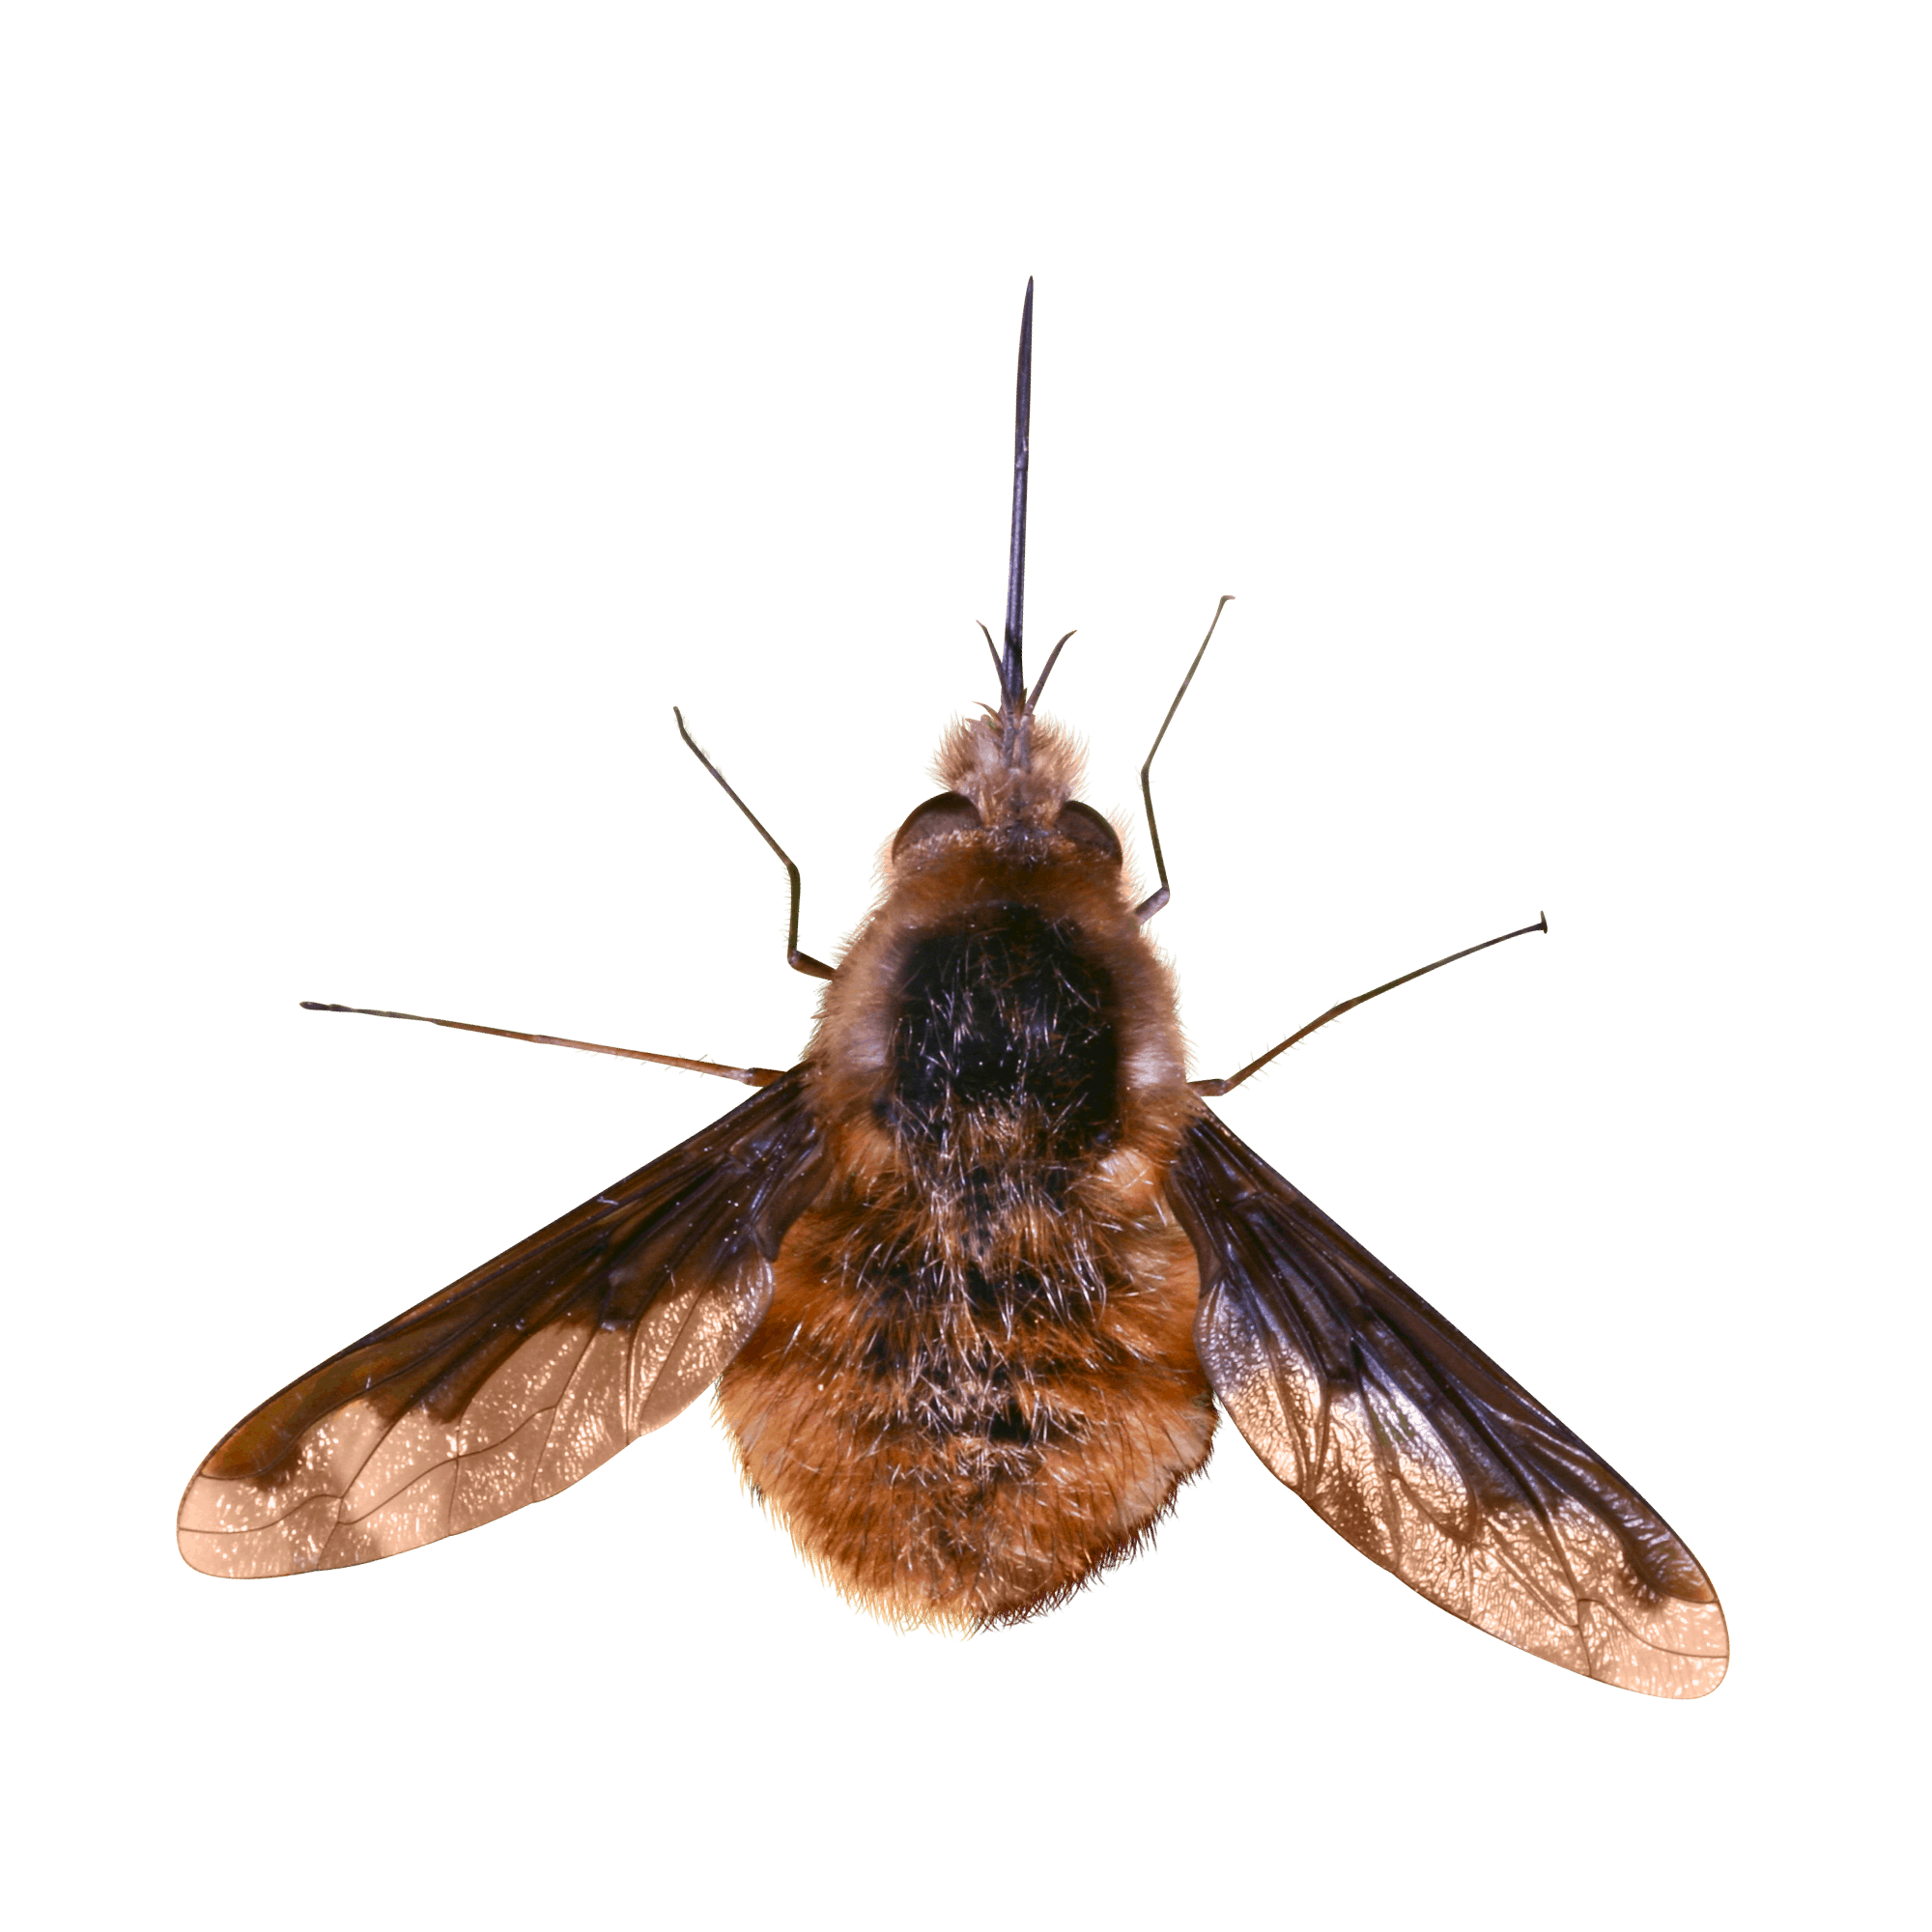 Grosser Wollschweber 9